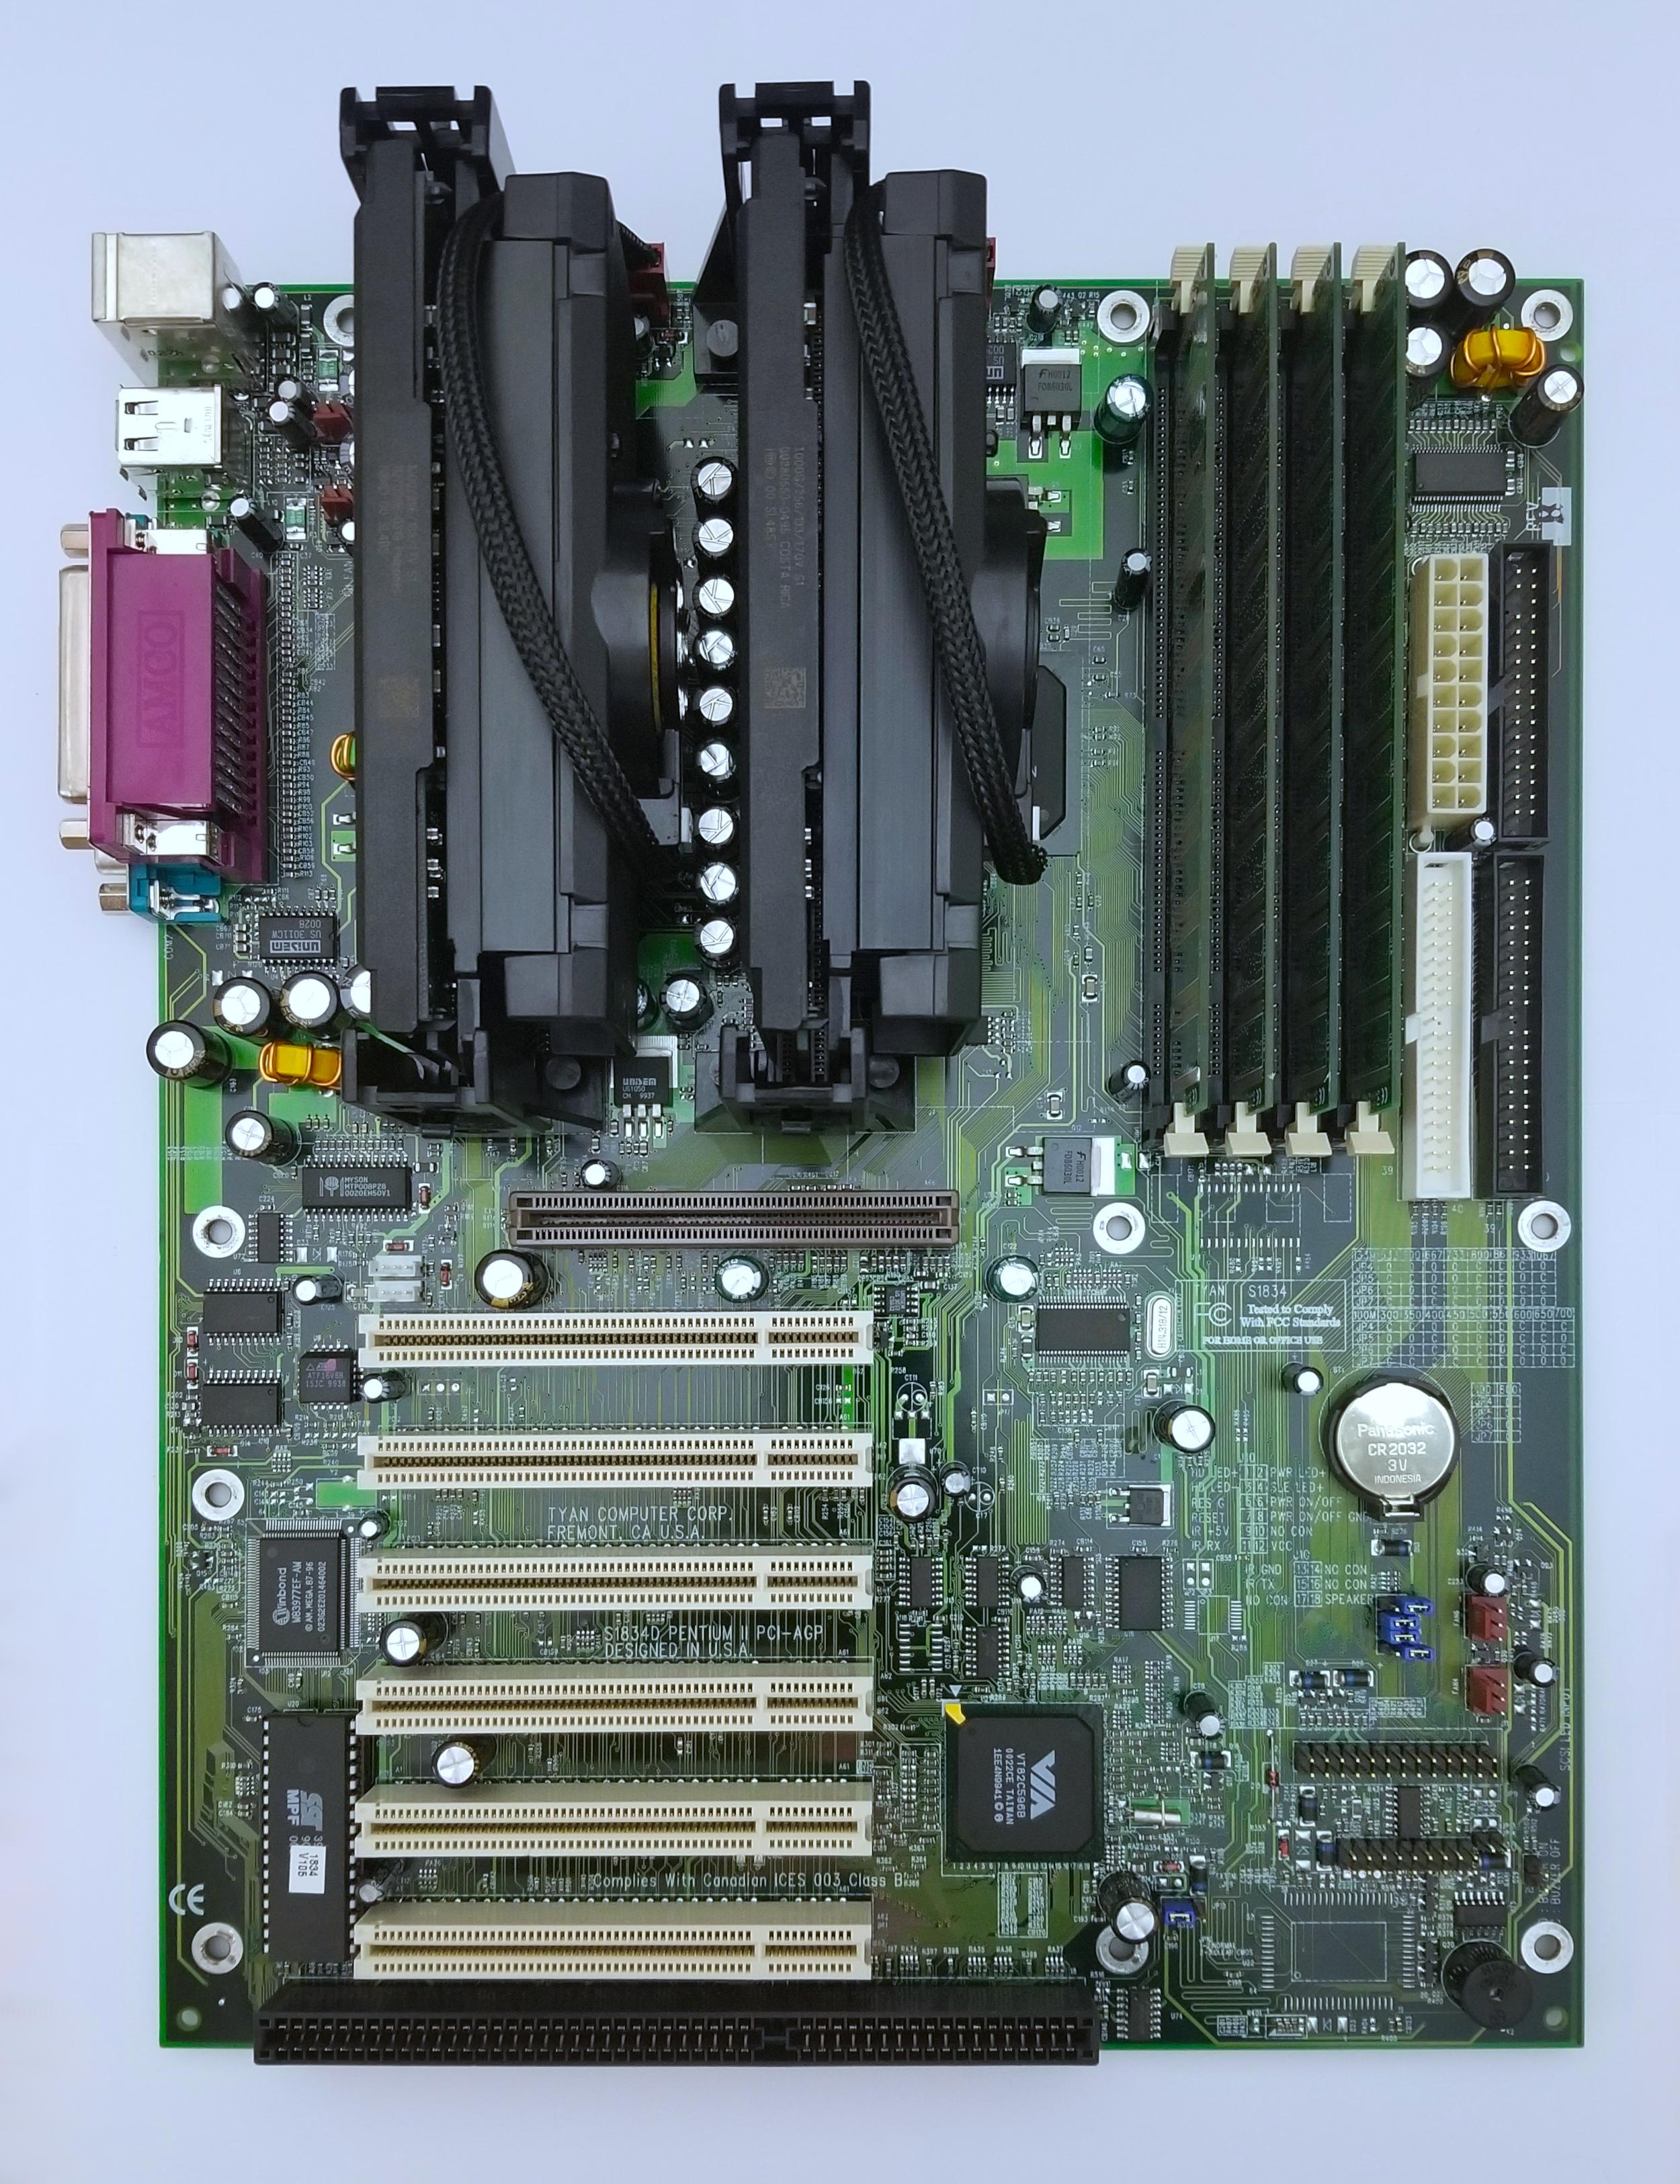 motherboard_tyan_tiger-133_v1.05.jpg